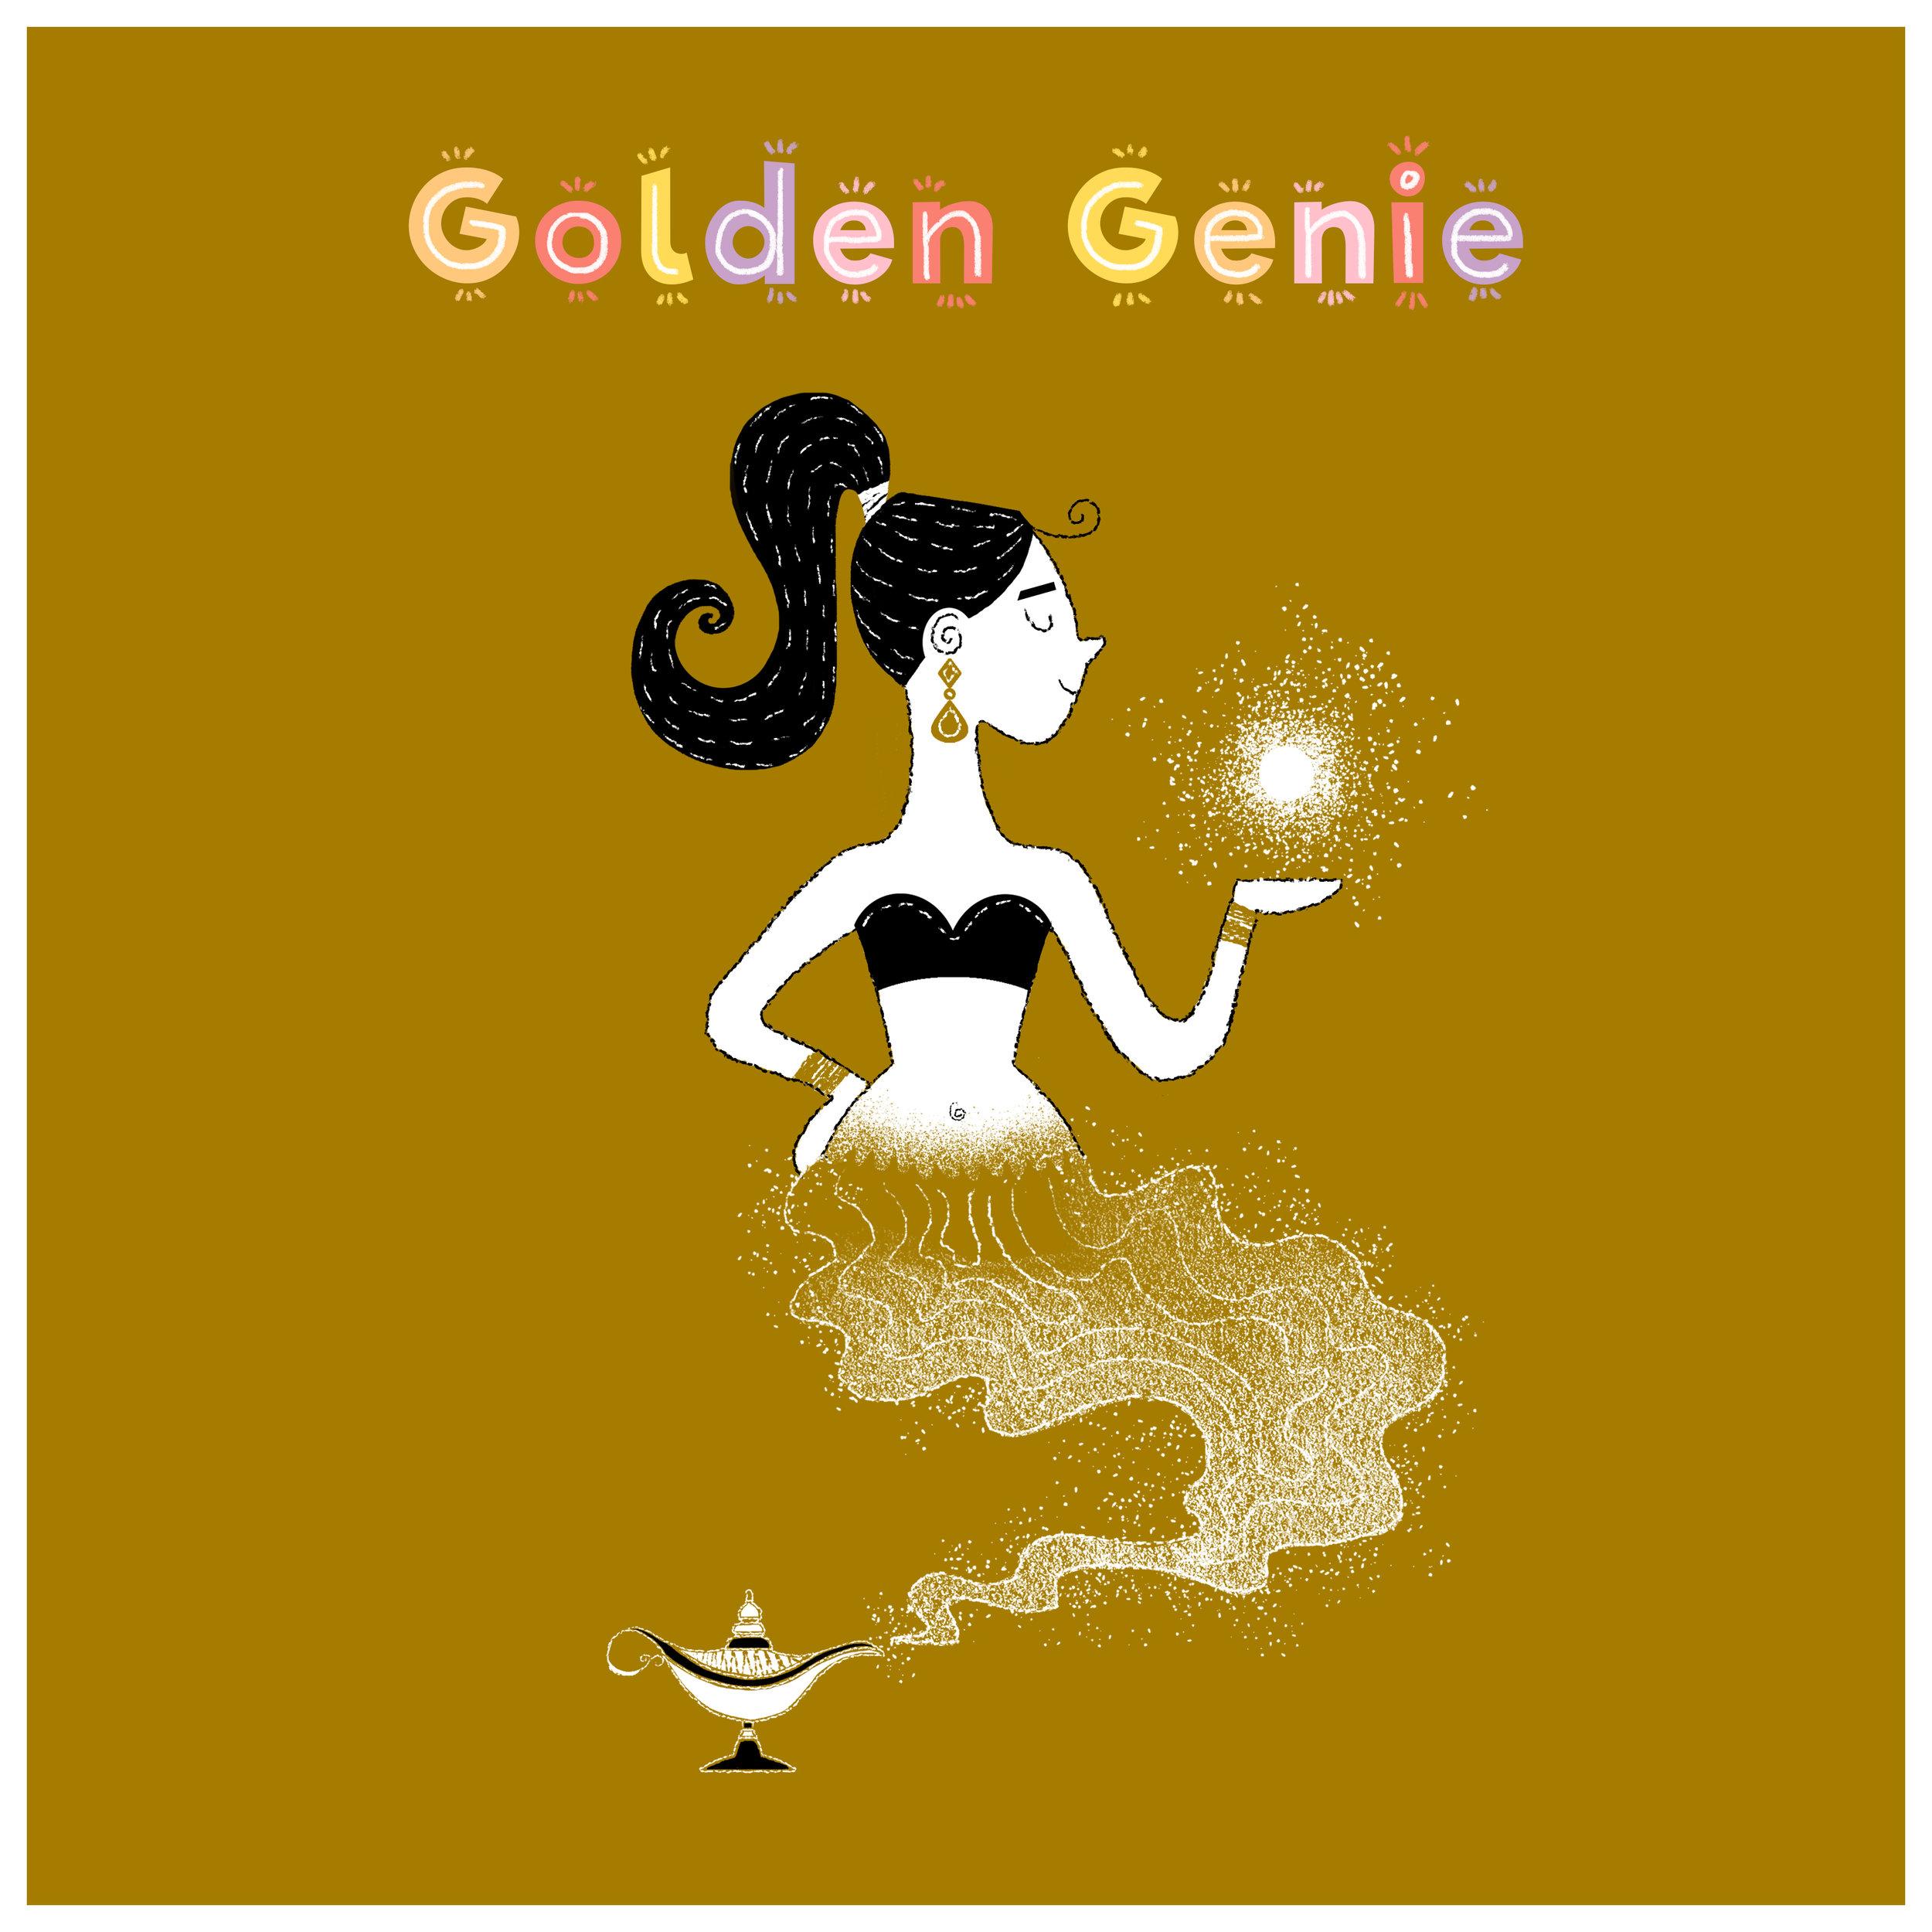 Art_Memory_Game_Cards_Golden_Genie.jpg